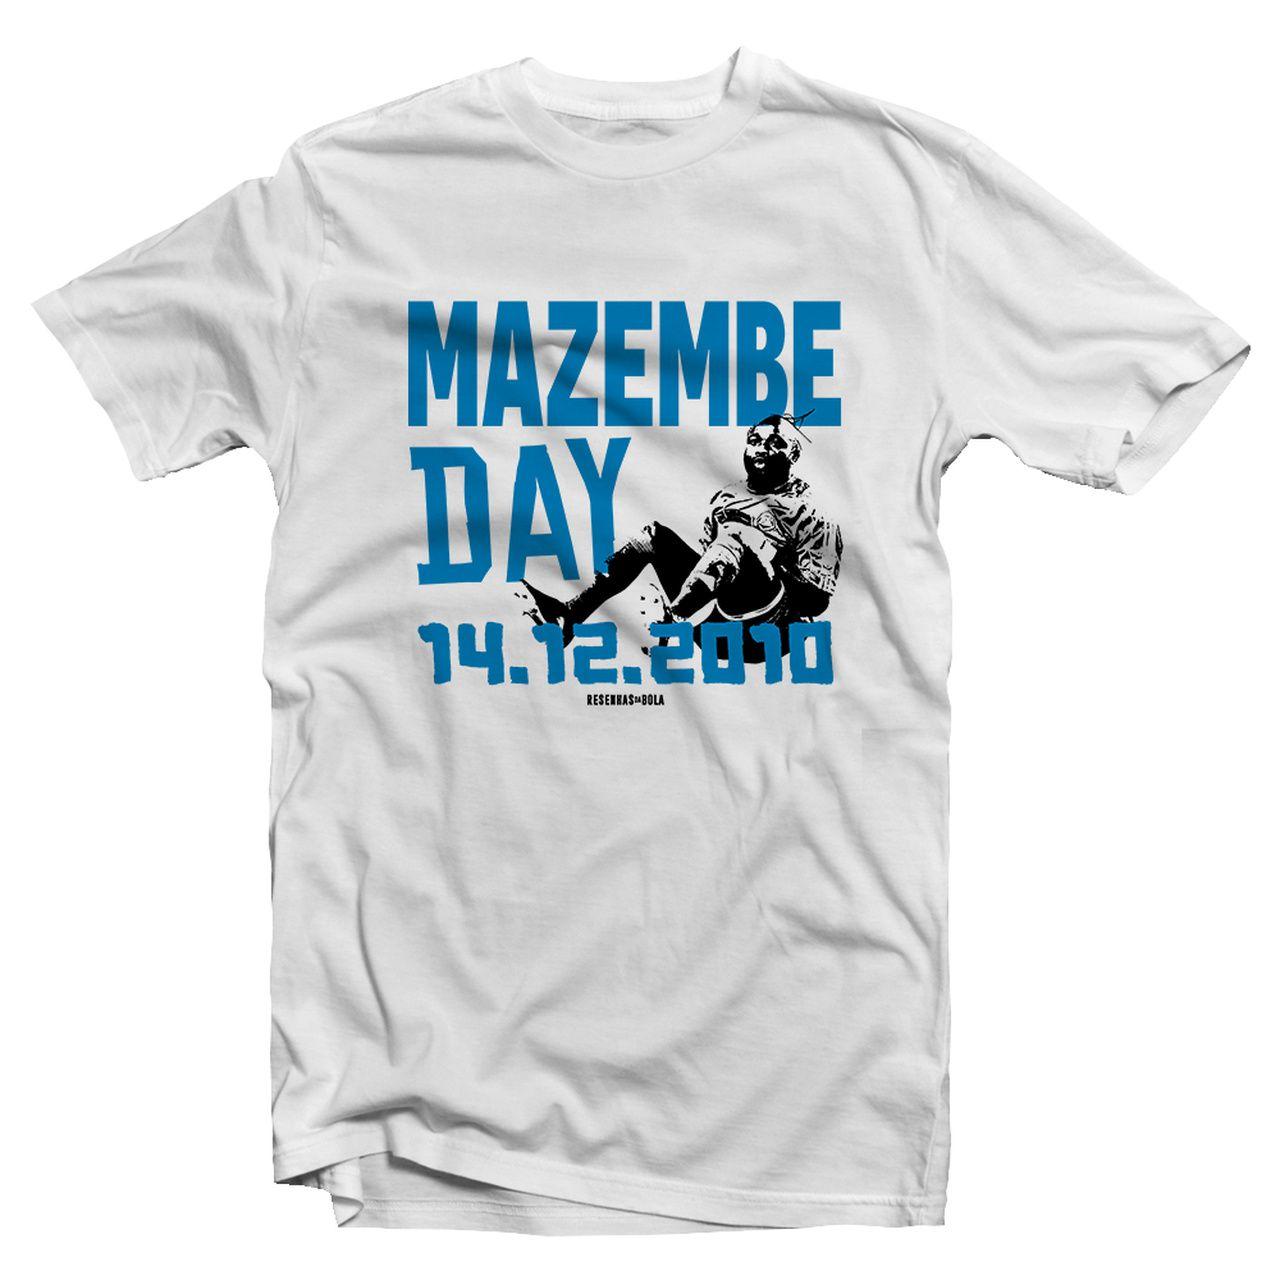 Camiseta - MAZEMBE DAY. Masculino